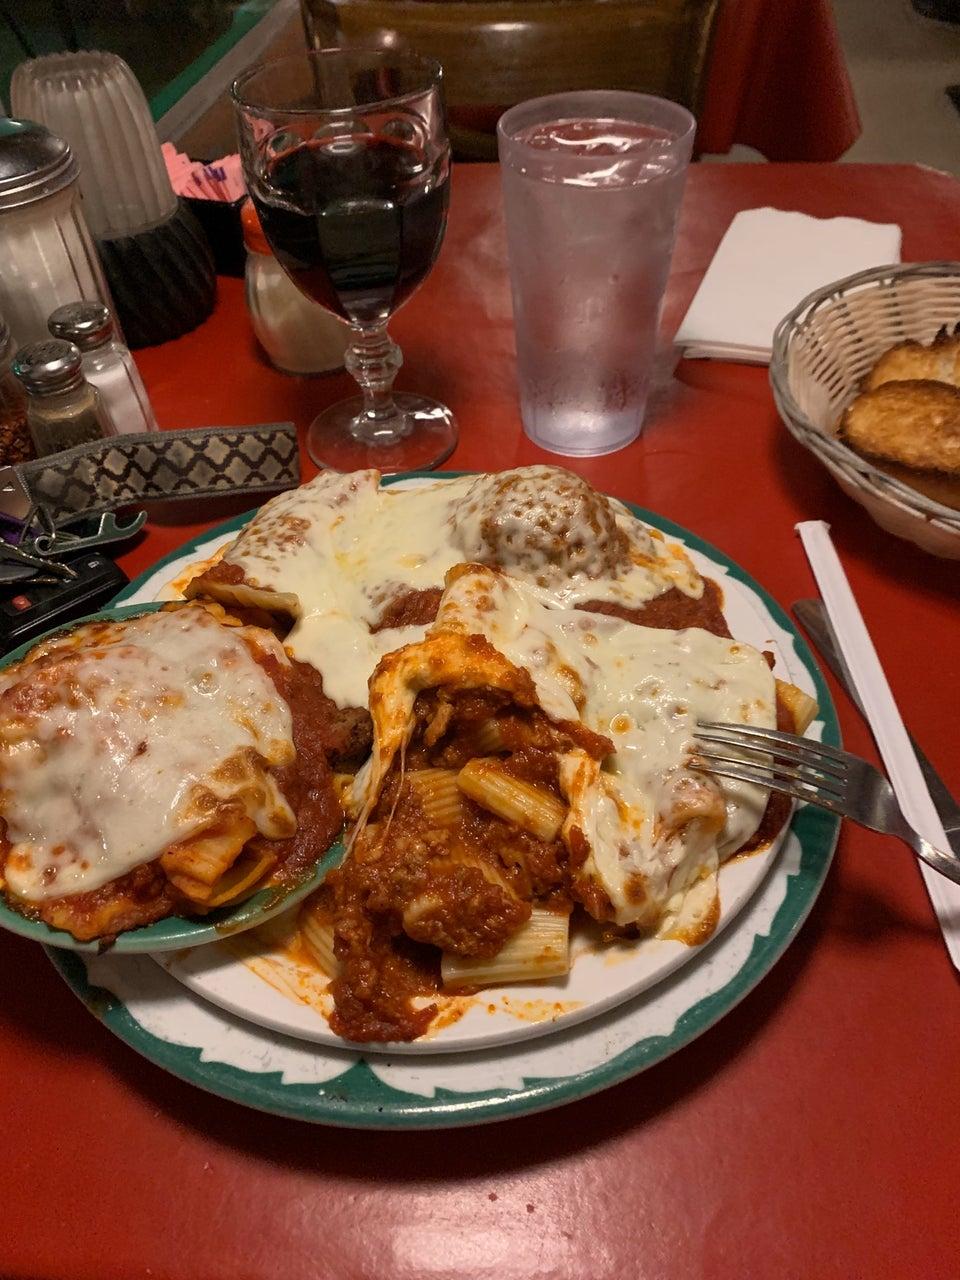 Dona Lupe Cafe 2919 Pershing Dr, El Paso